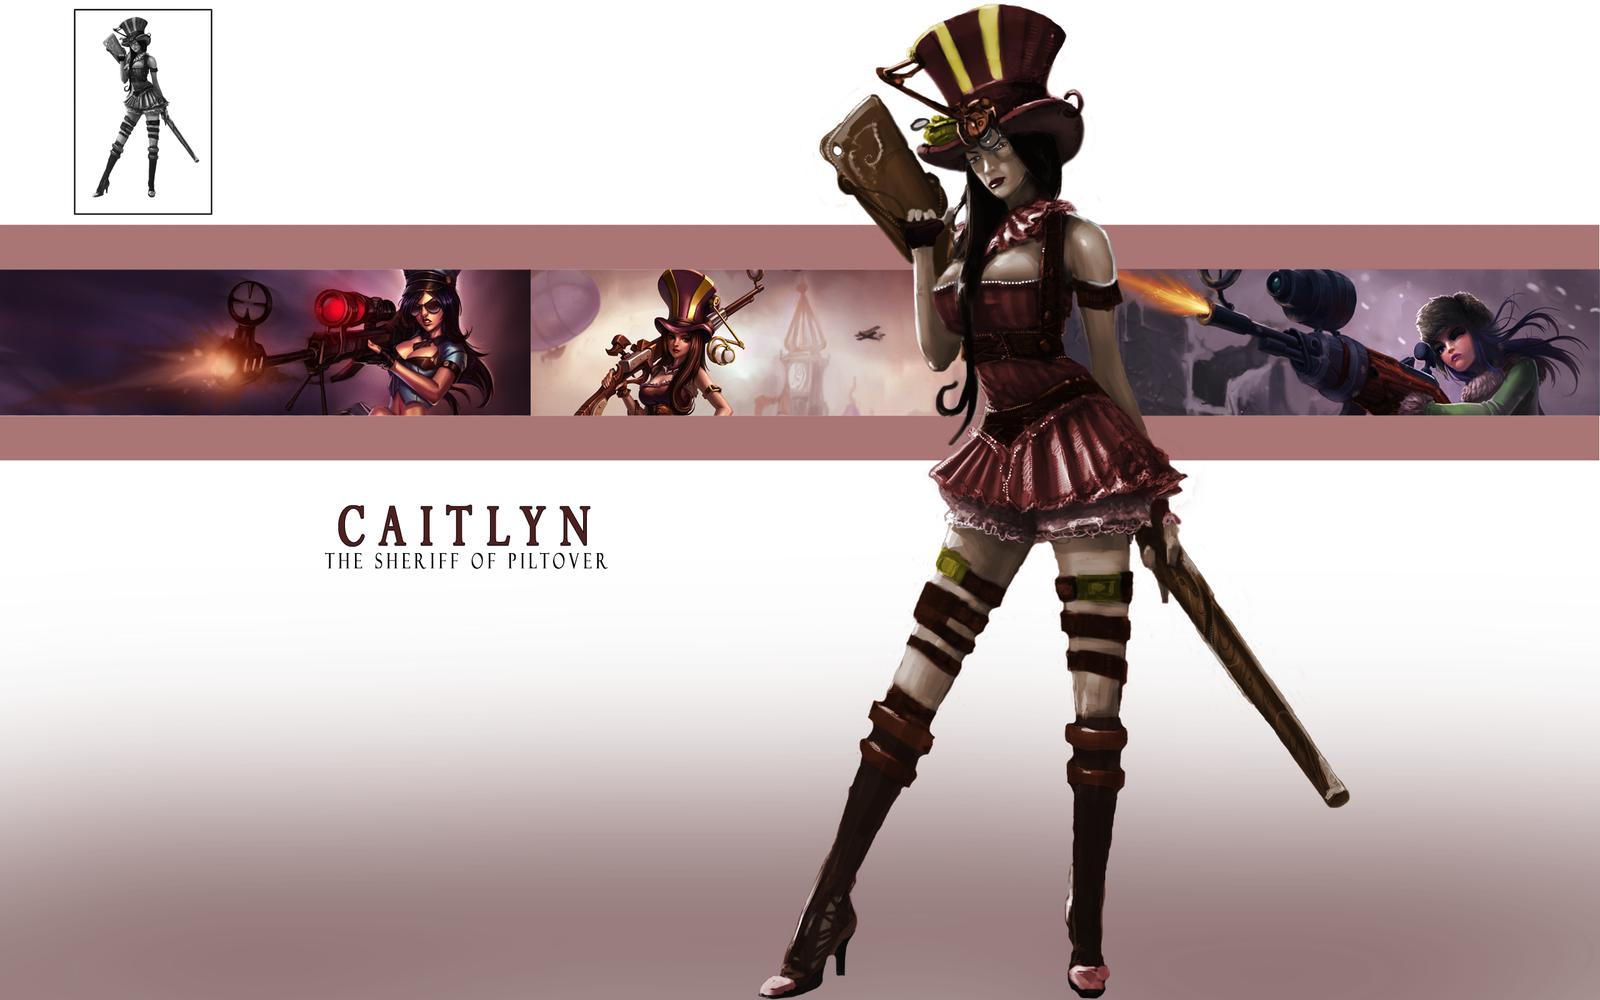 Caitlyn League of Legends by ArturoRenders on DeviantArt